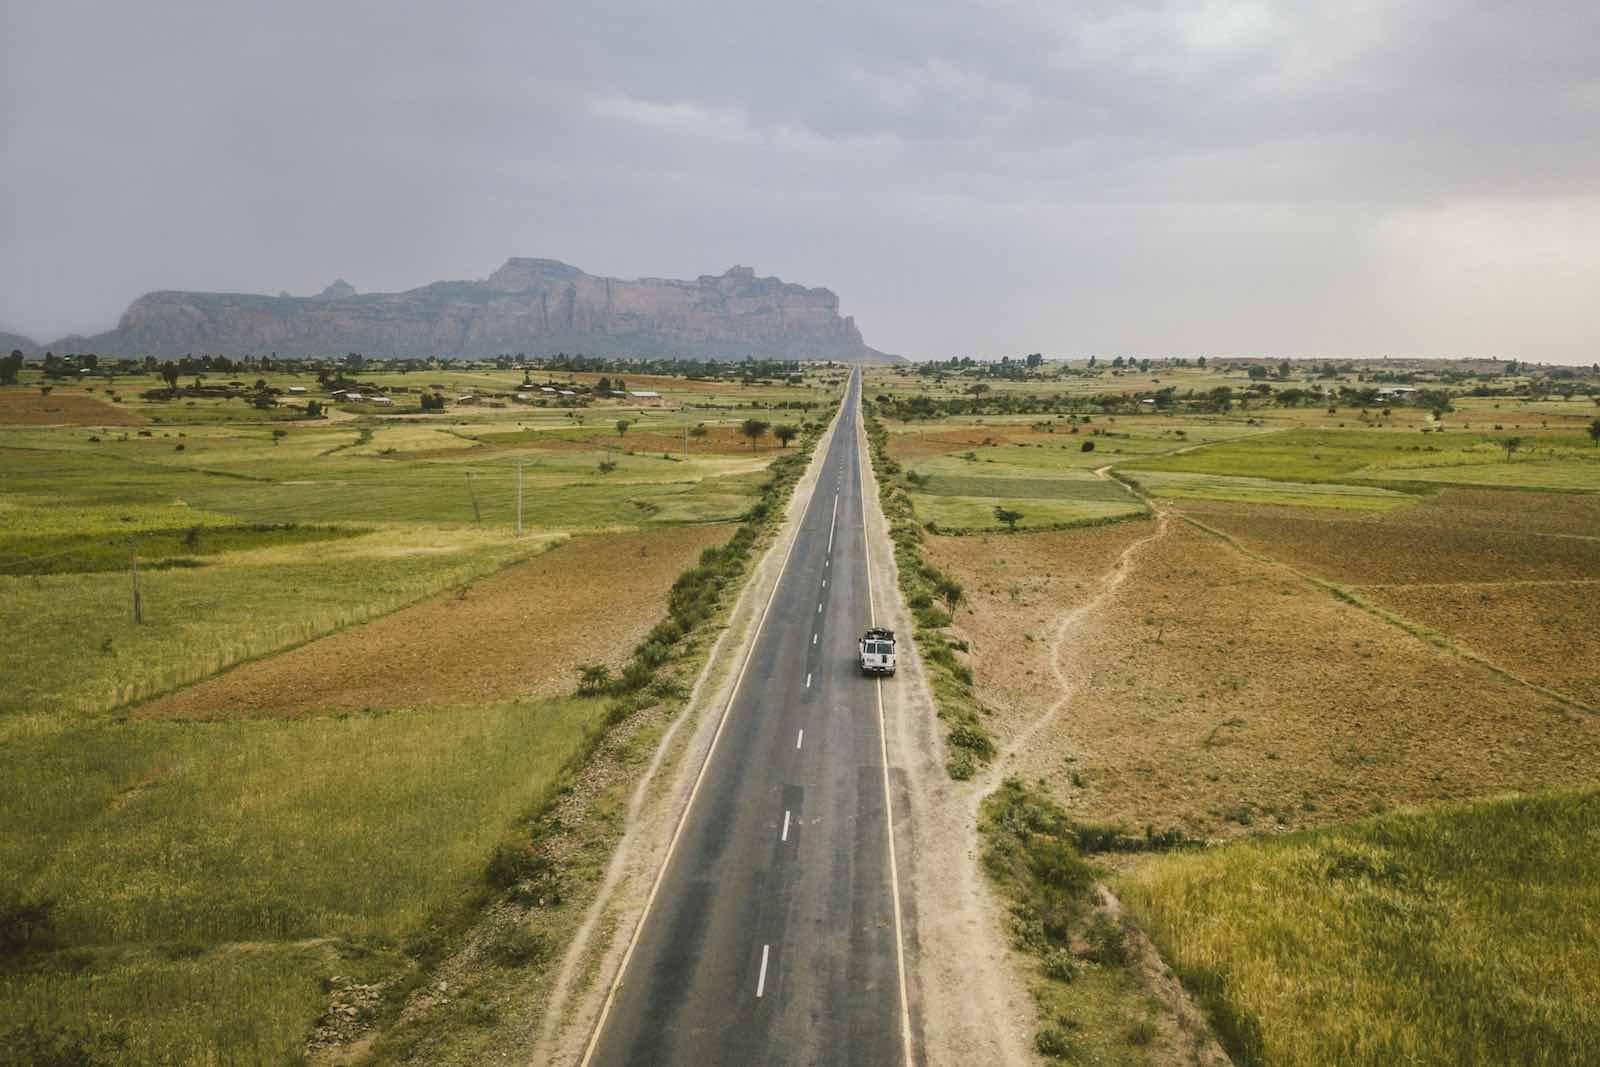 Tigray region, northern Ethiopia (Photo: Getty Images)